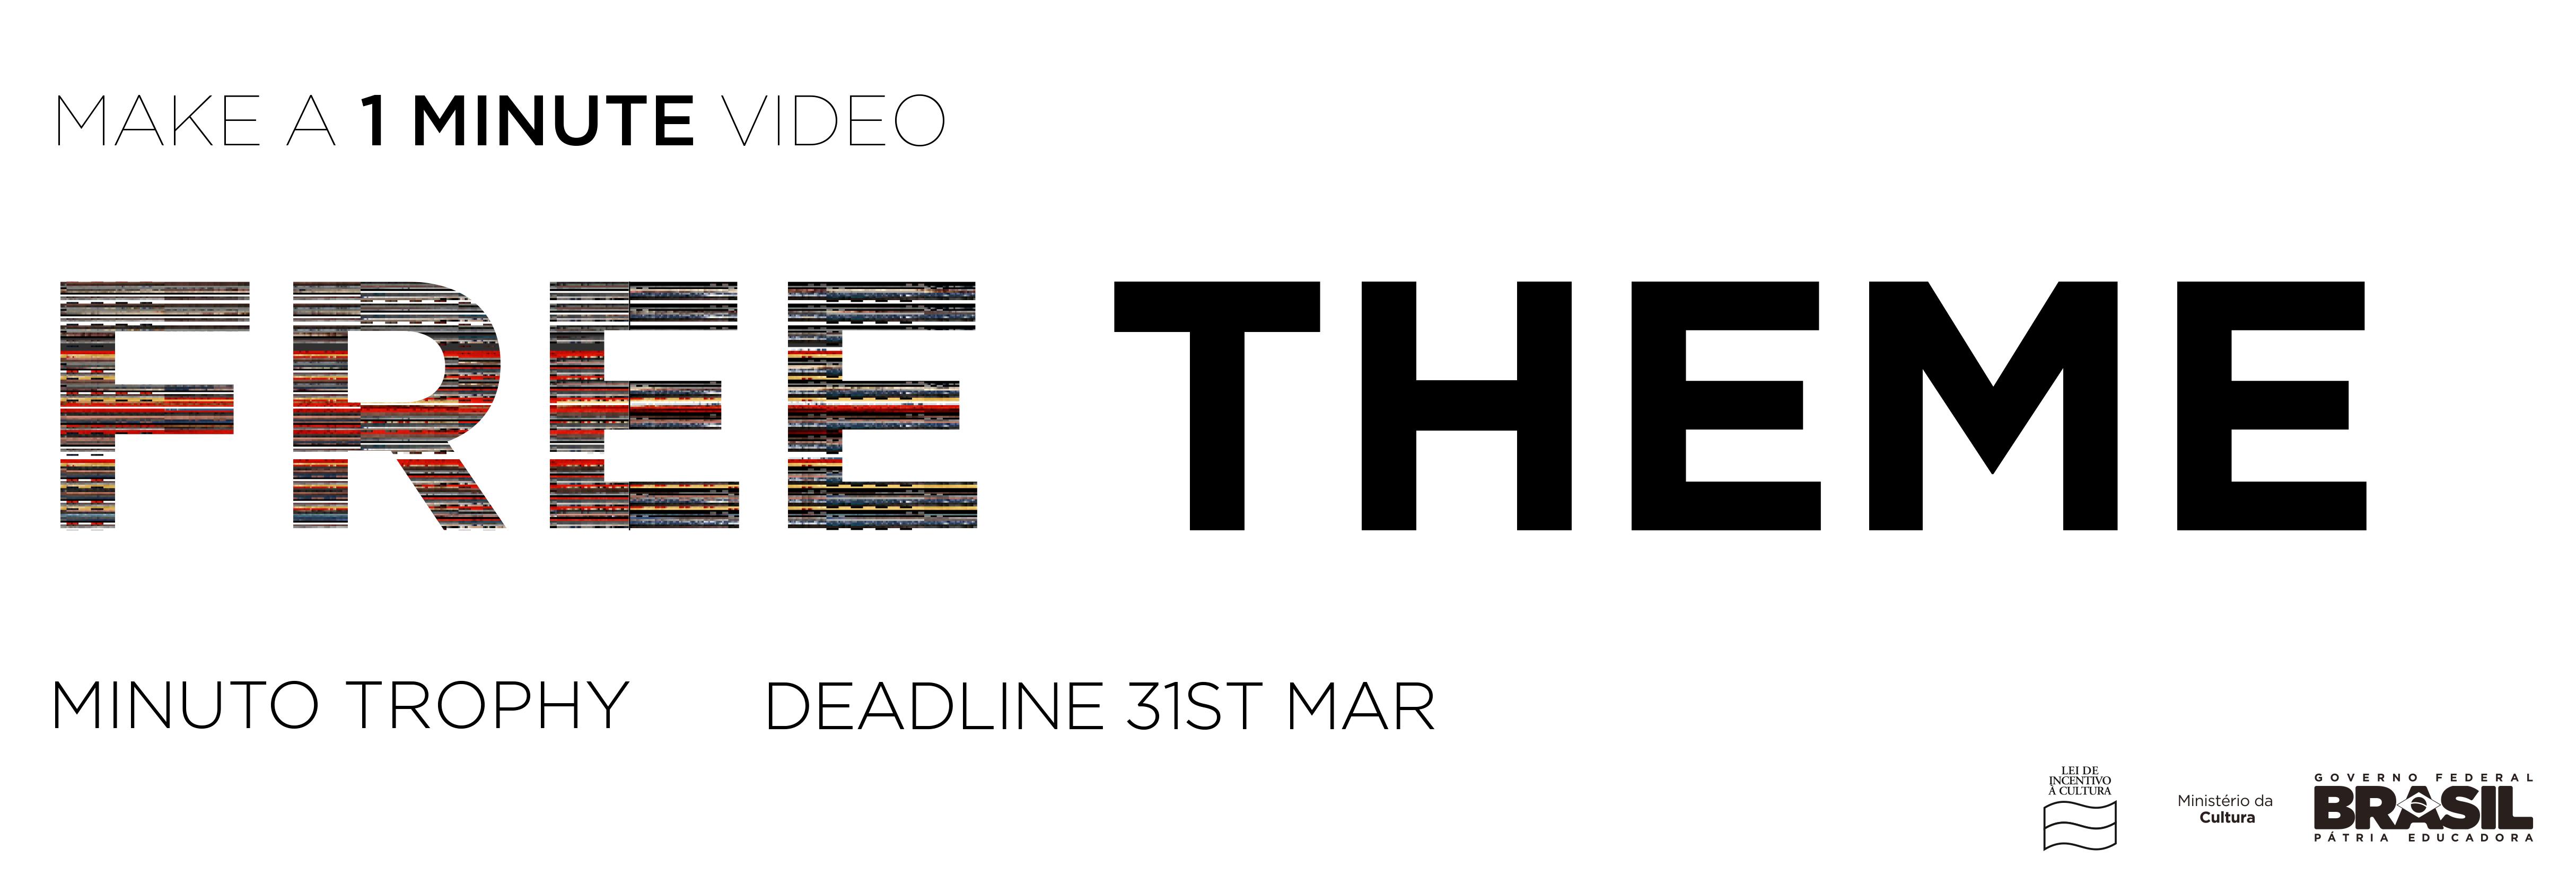 Free Theme - March 2016